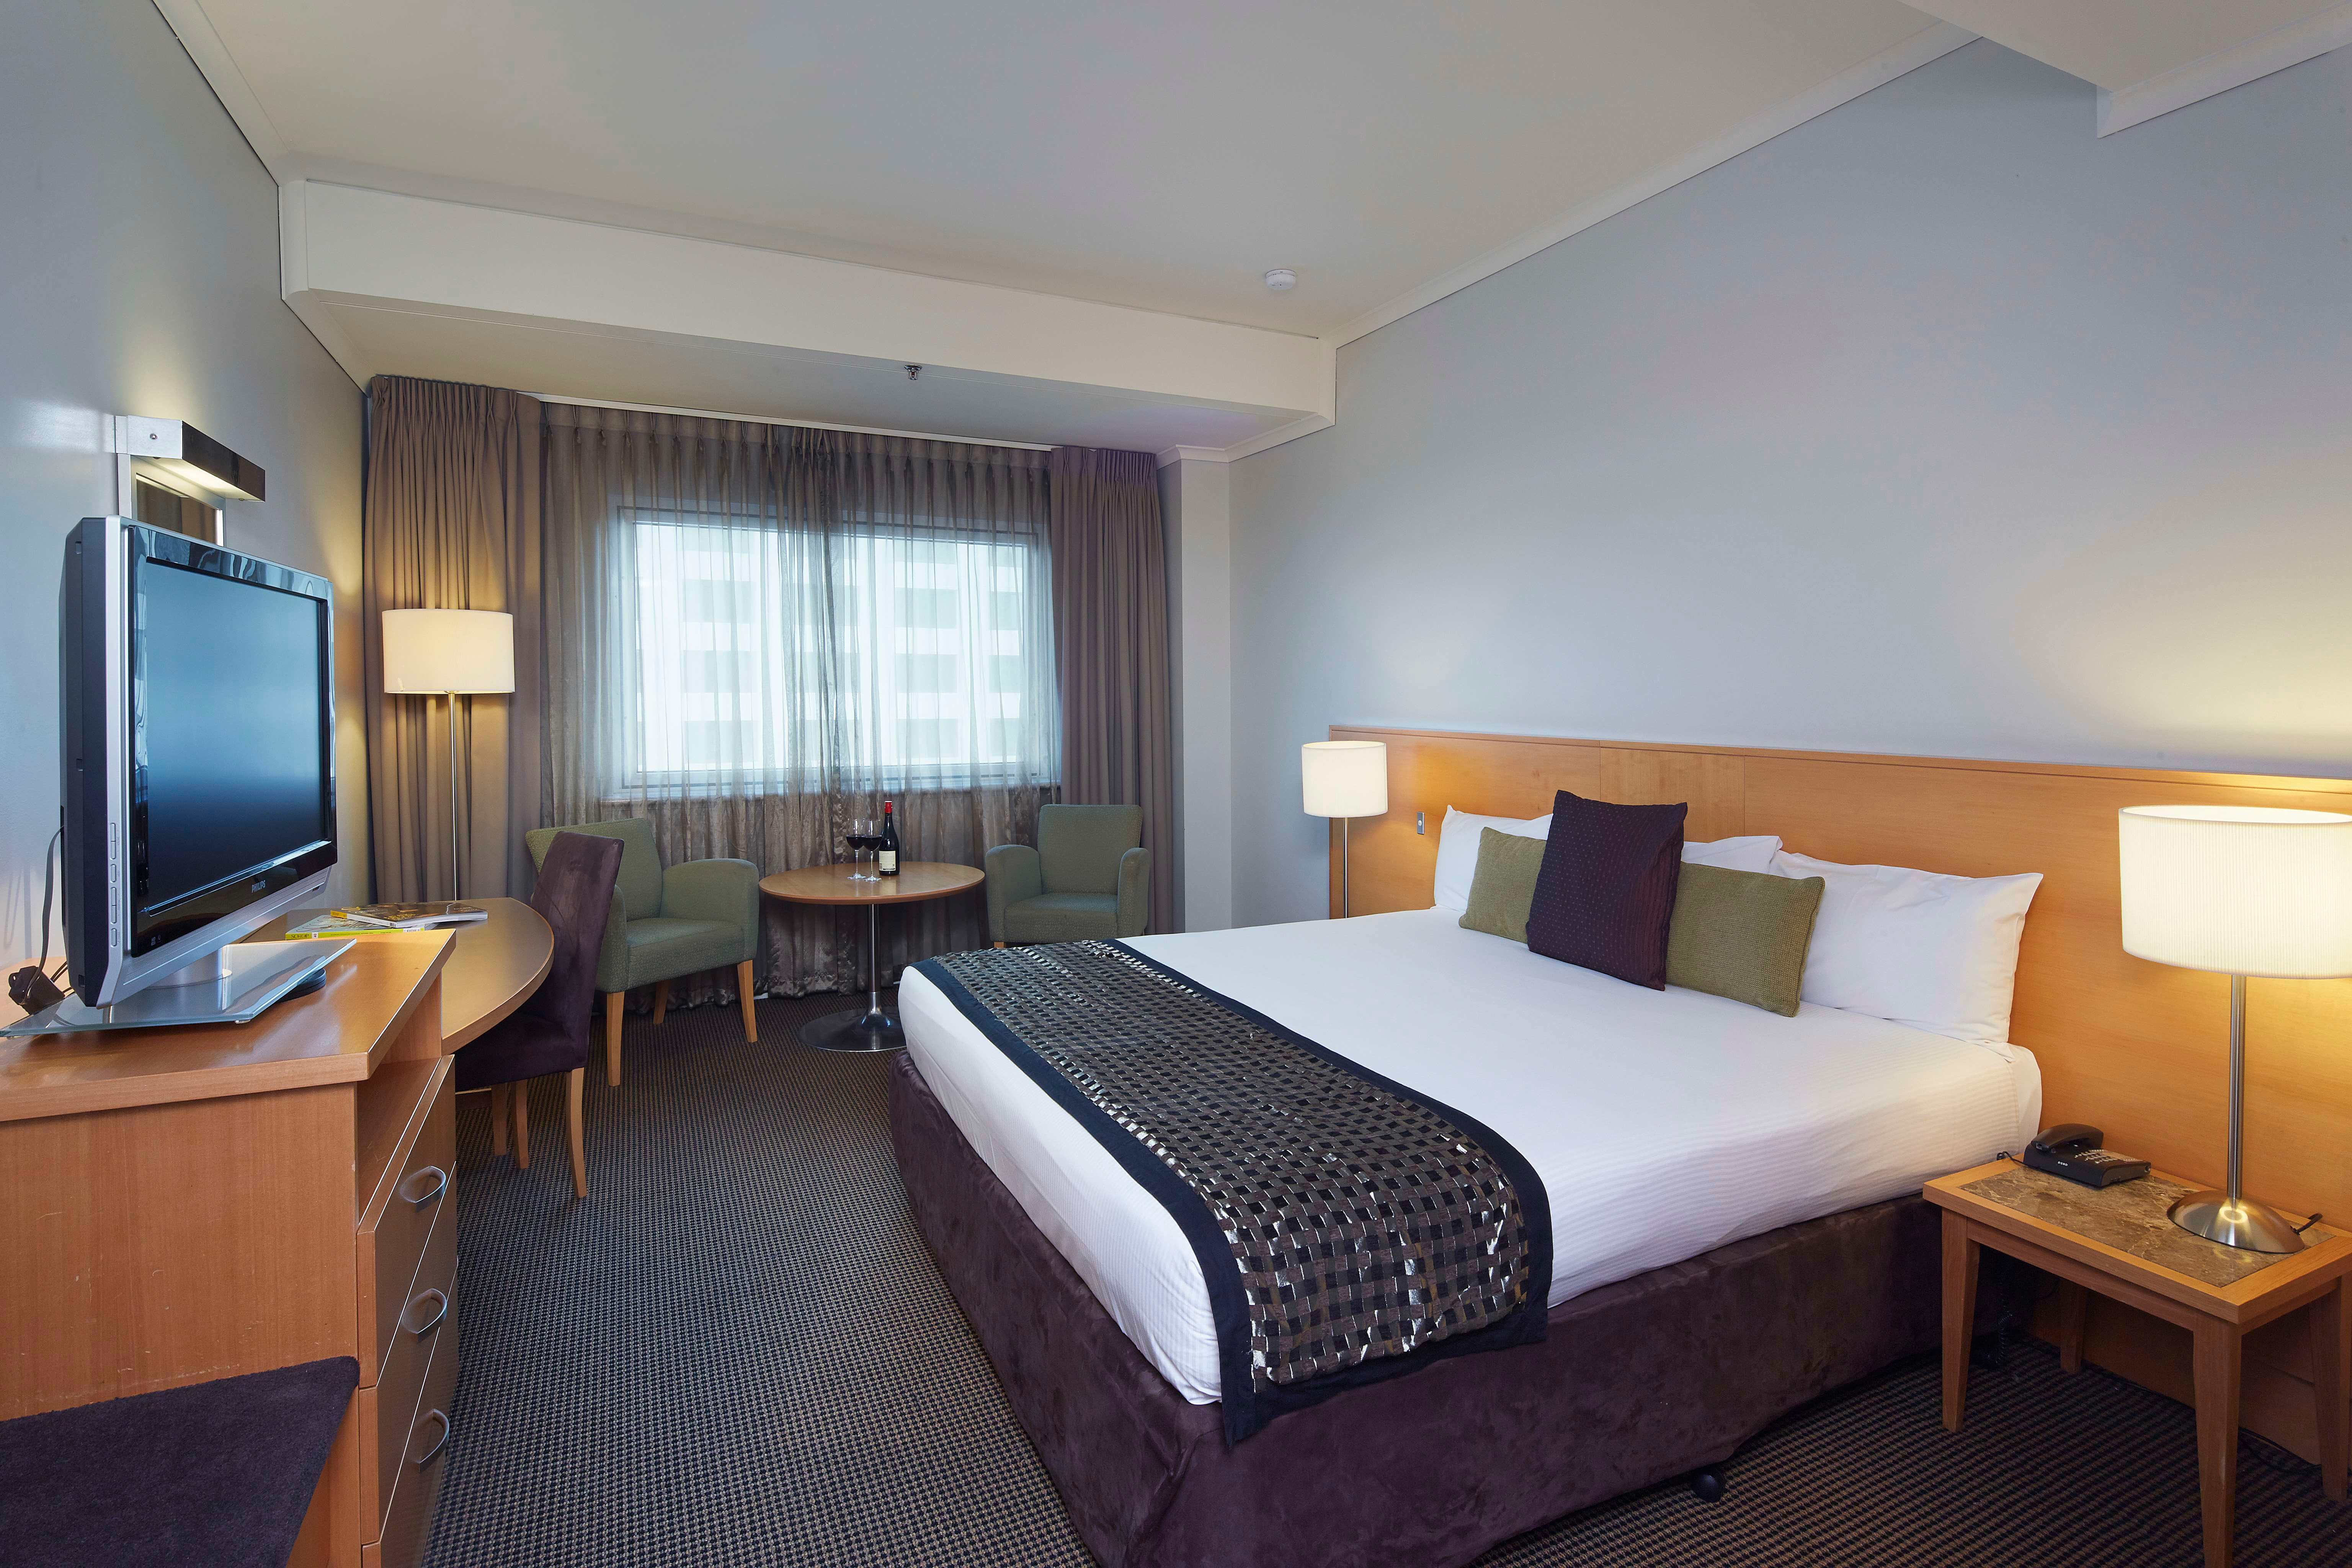 Perth Novotel Langley bedroom